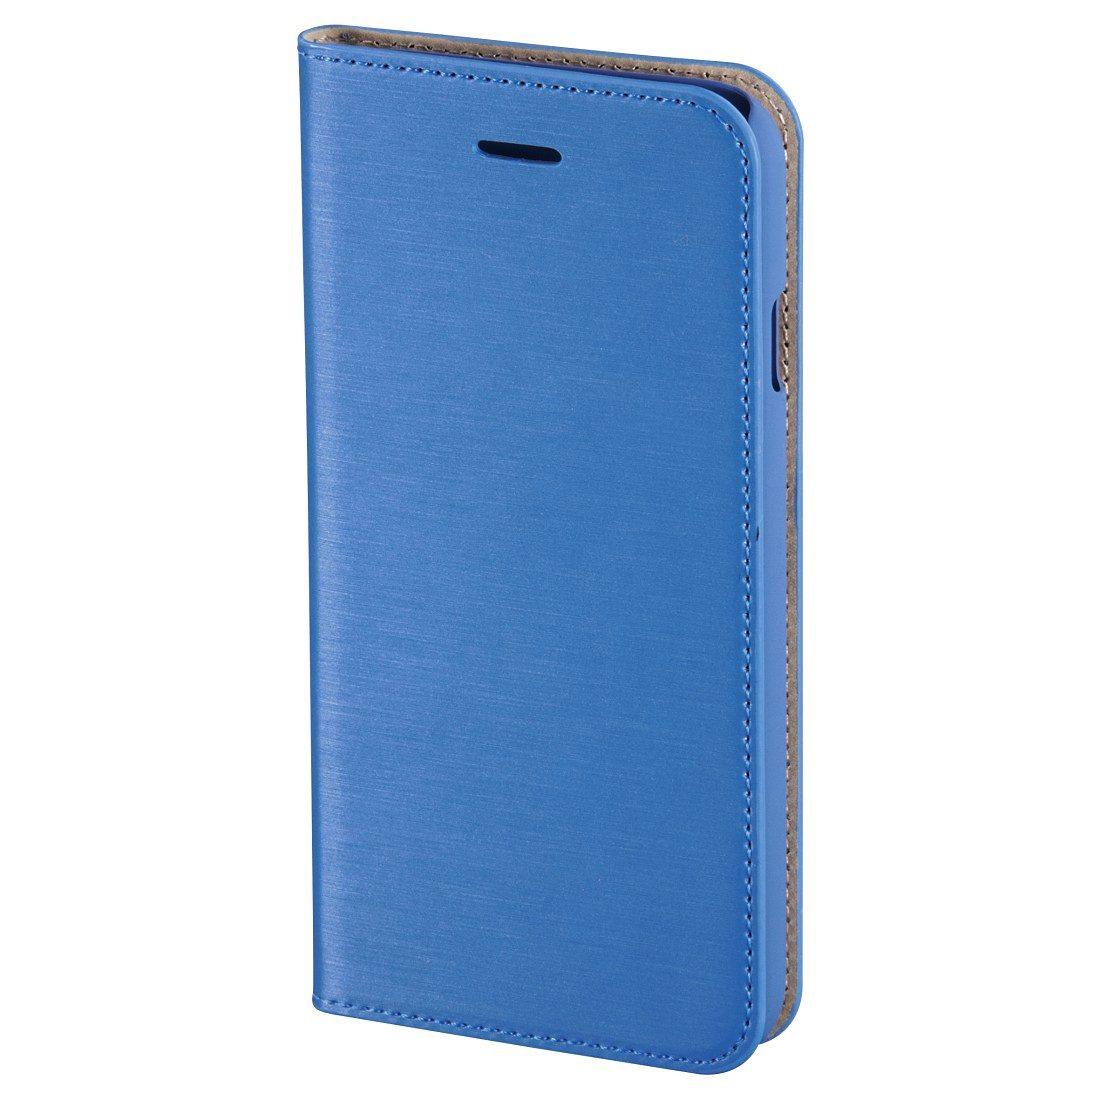 Hama Booklet Slim für Apple iPhone 6, Ozeanblau